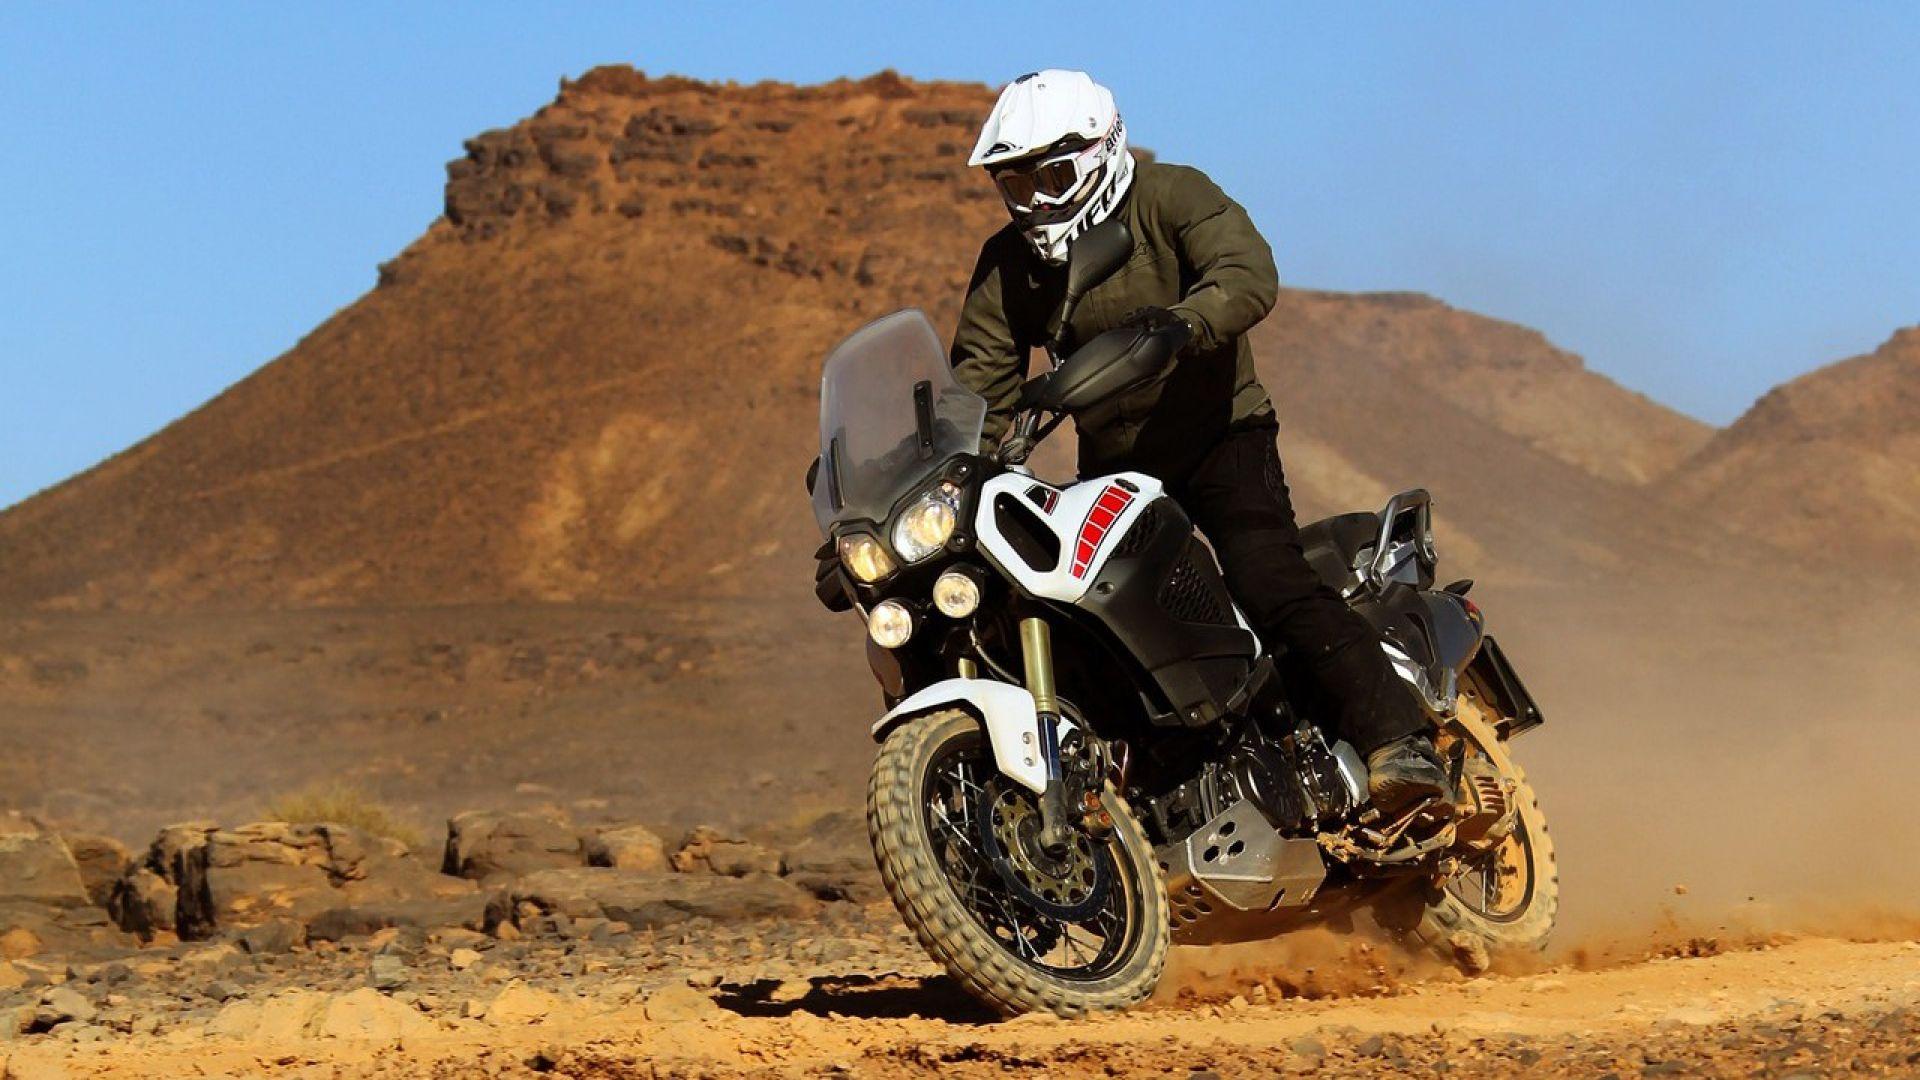 Immagine 105: In Marocco con la Yamaha Super Ténéré